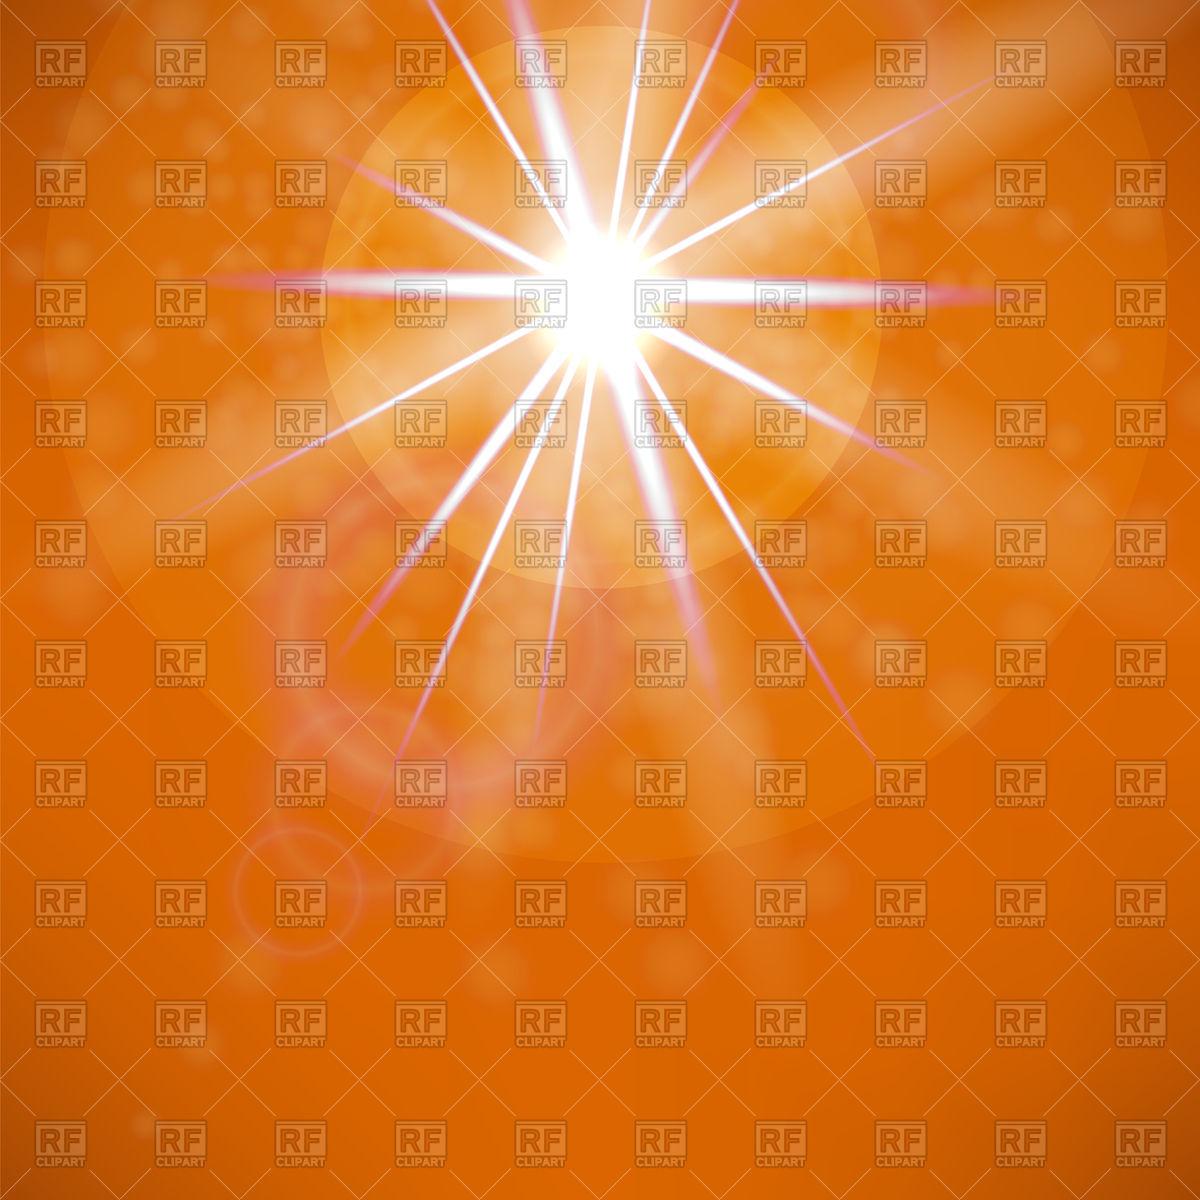 Summer sun on orange sky background Vector Image #95084.